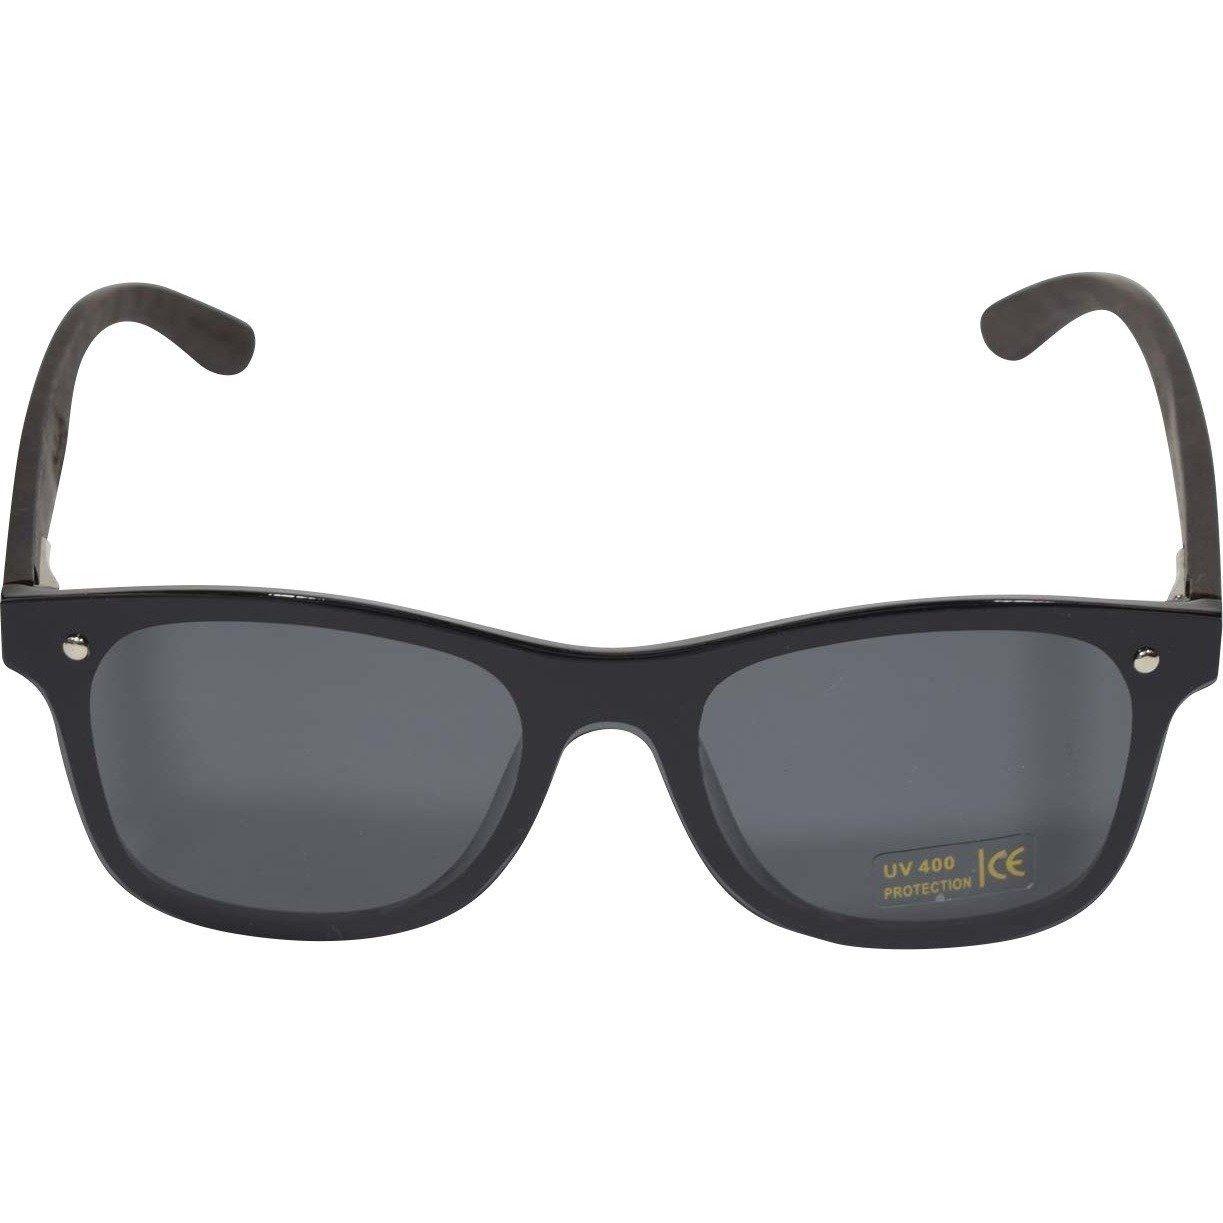 d134f538 Premium Sunglasses 1504-1 | Products | Sunglasses, Glasses, Sunnies